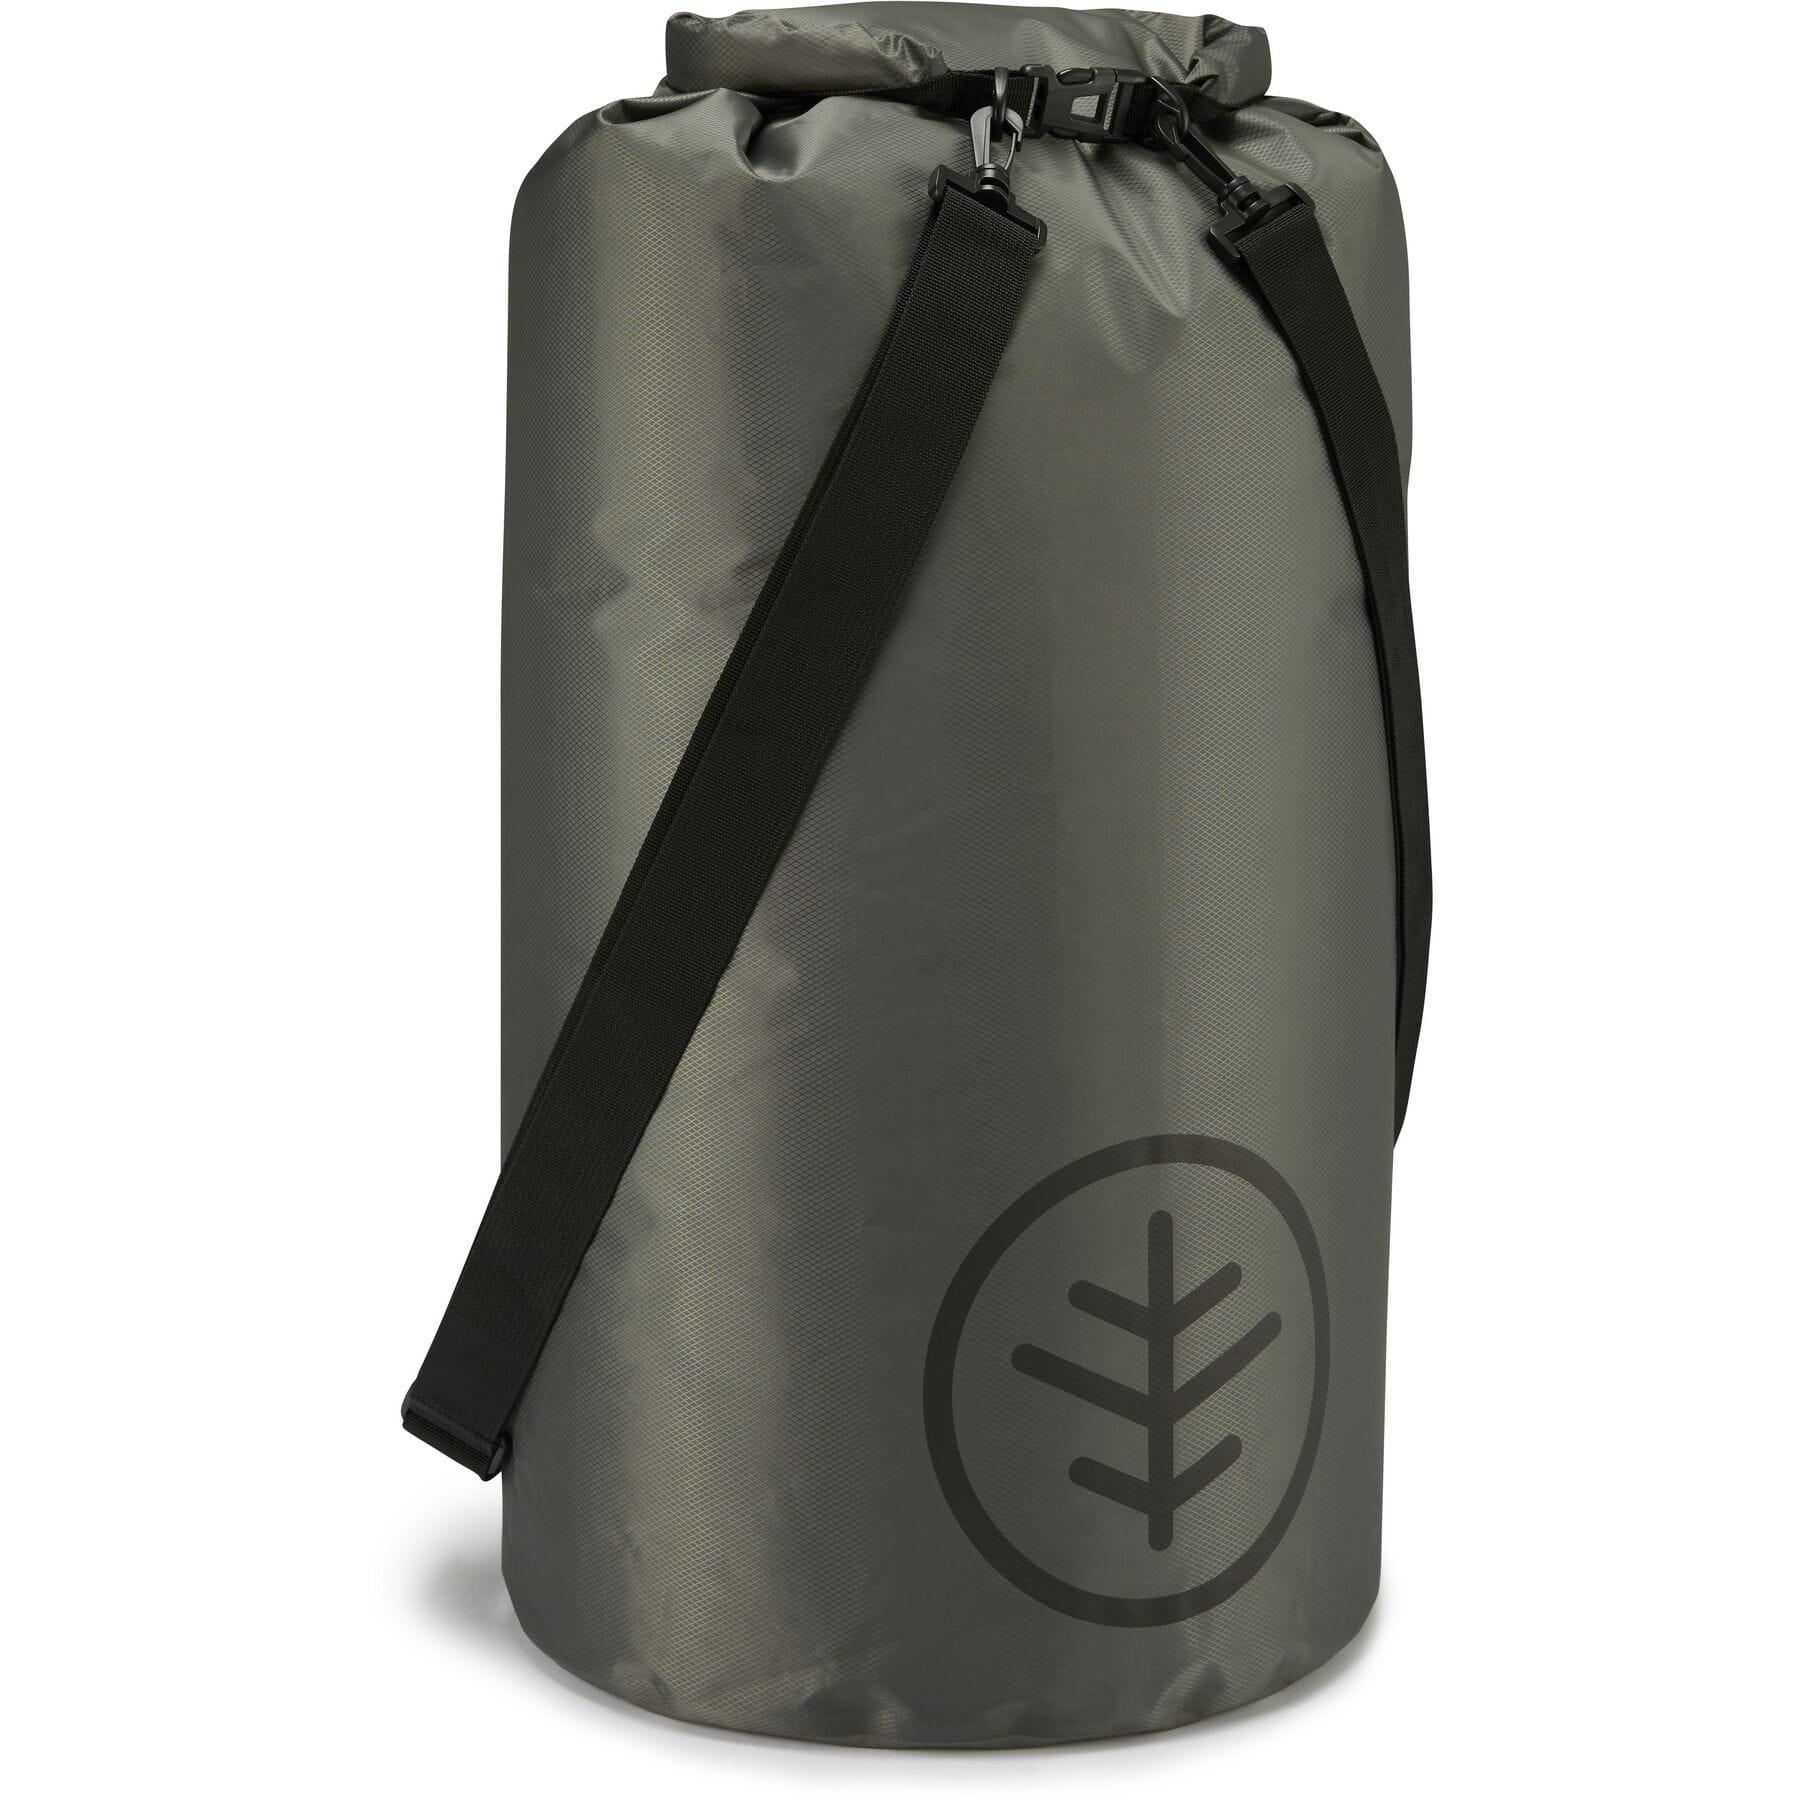 Vak Wychwood Dry Bag 50ltr